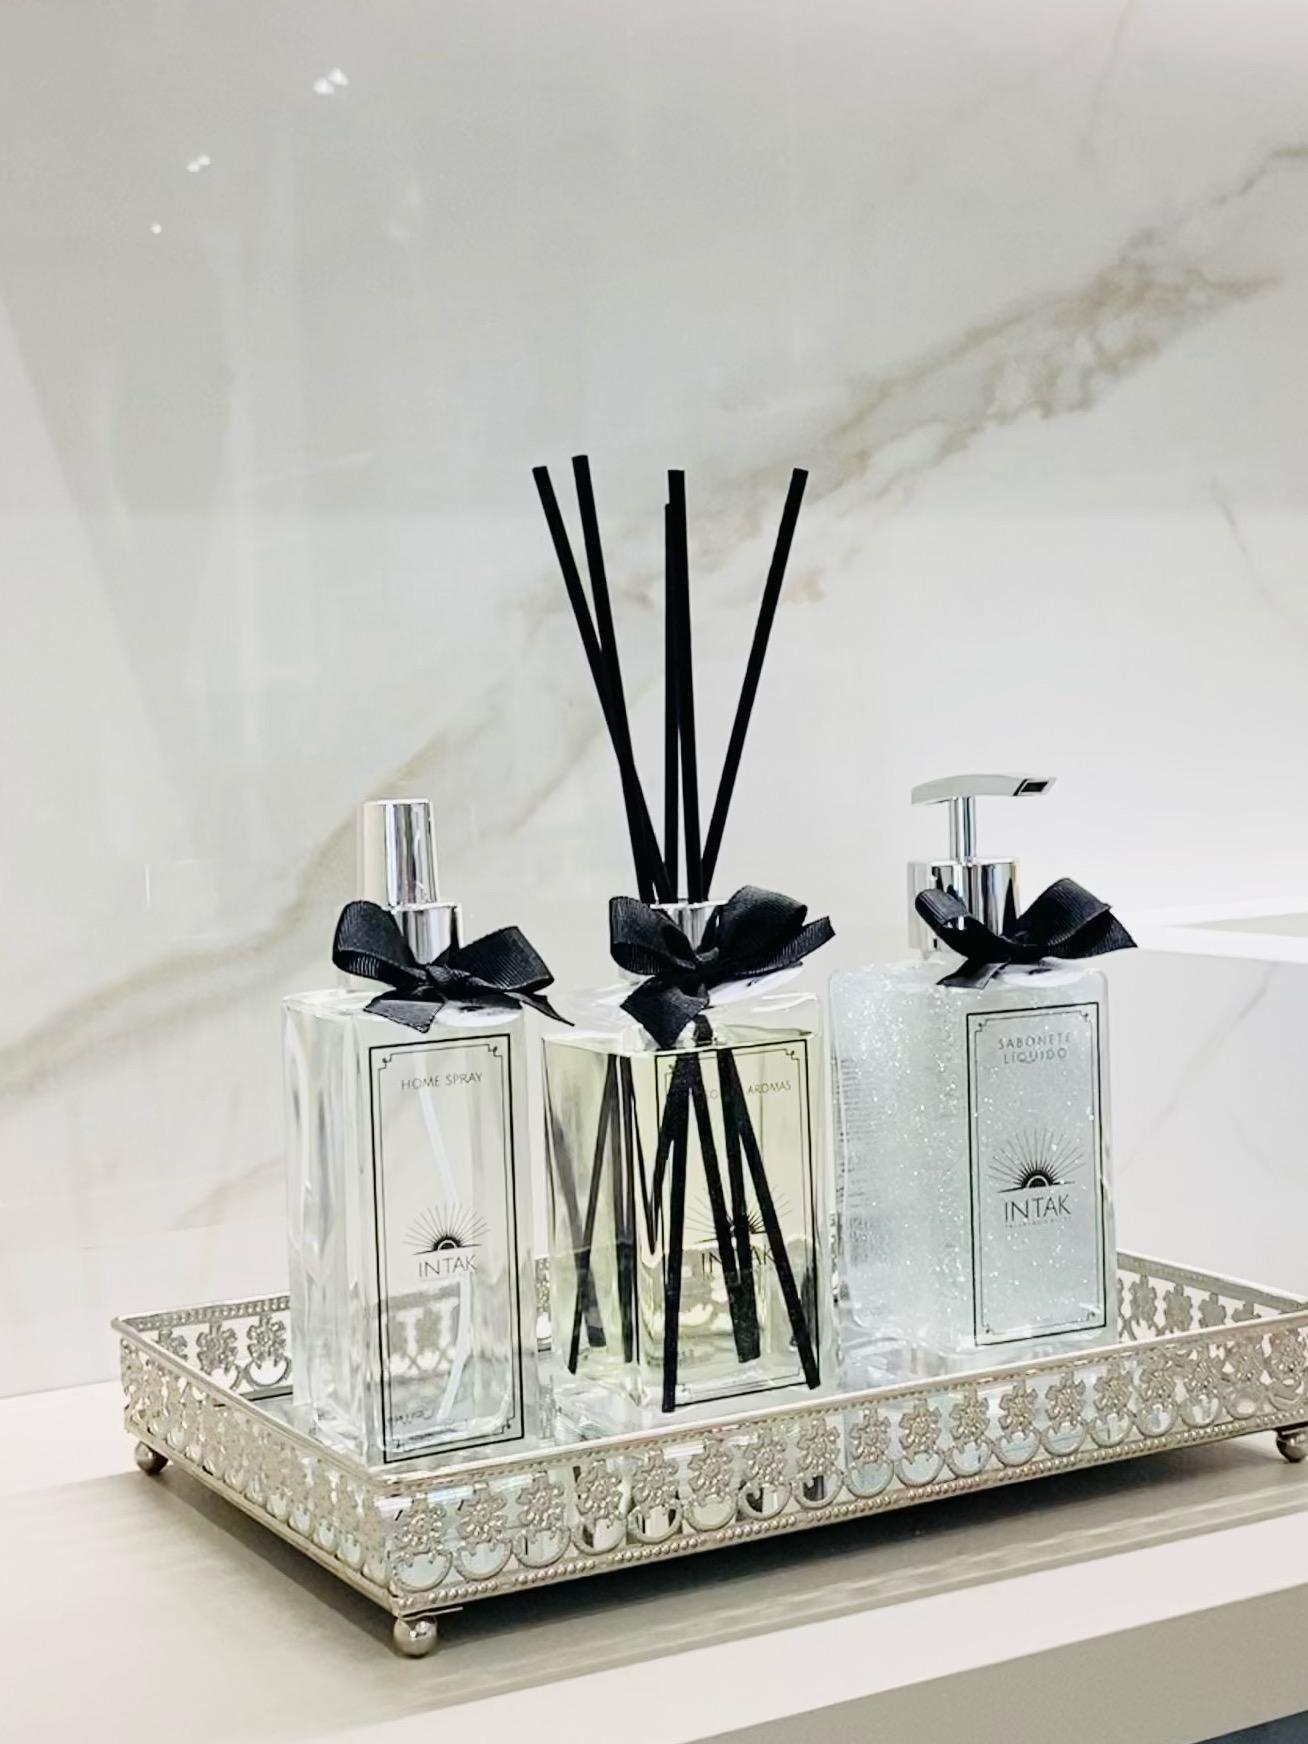 Kit Lavabo Bandeja Prata em Espelho M com Difusor 250ml - Chá Branco